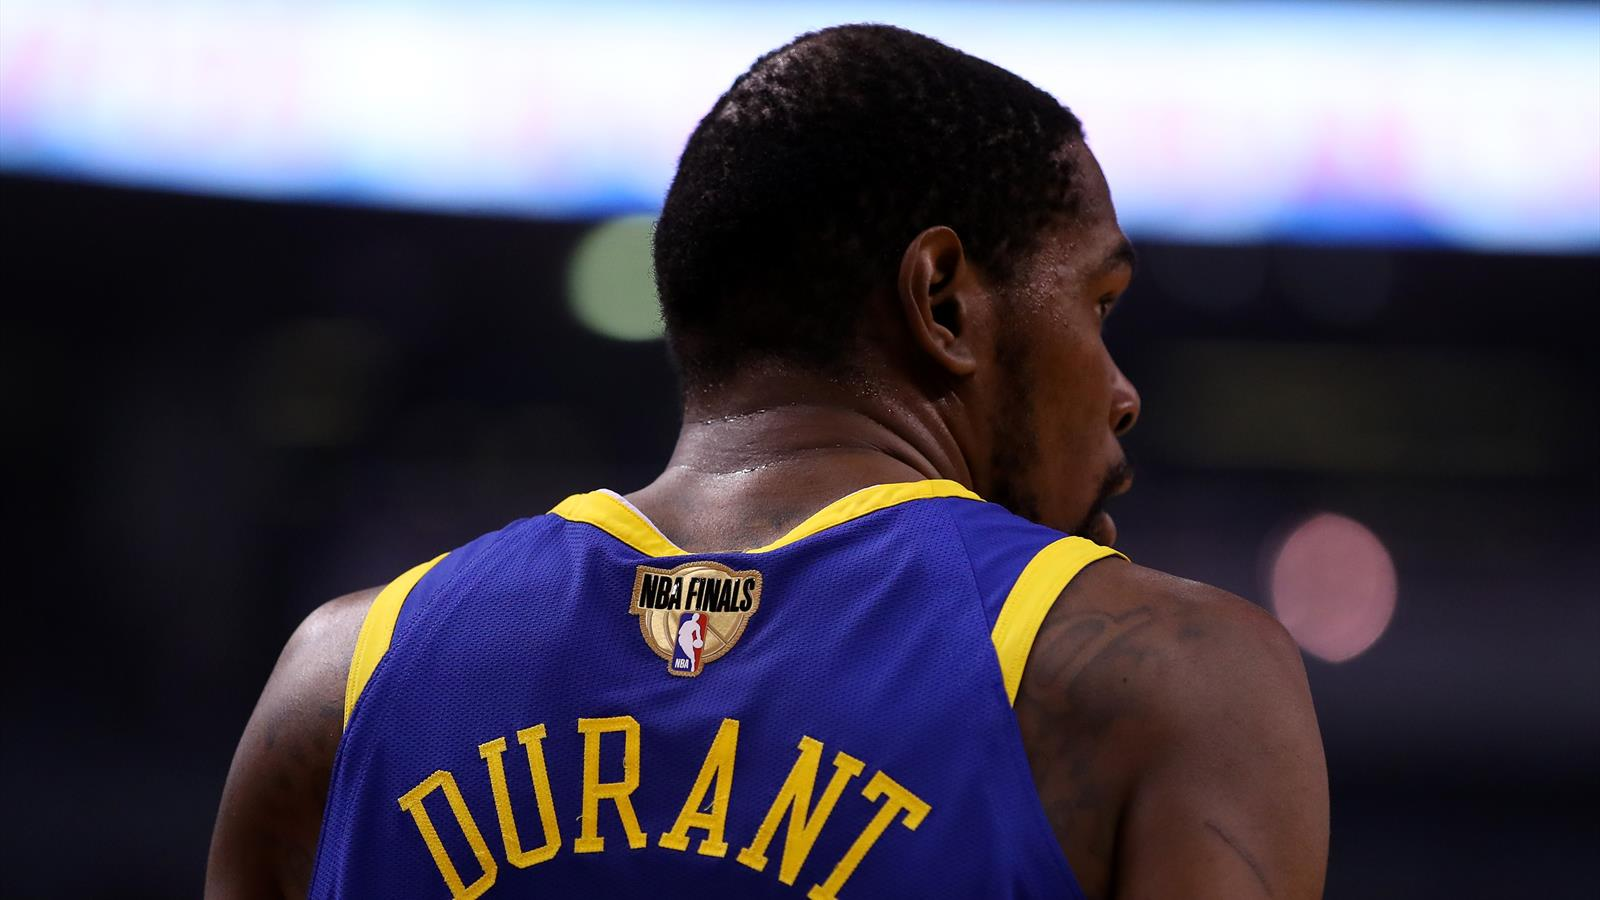 Séisme en NBA : Kevin Durant sera bien agent libre - Eurosport.fr image